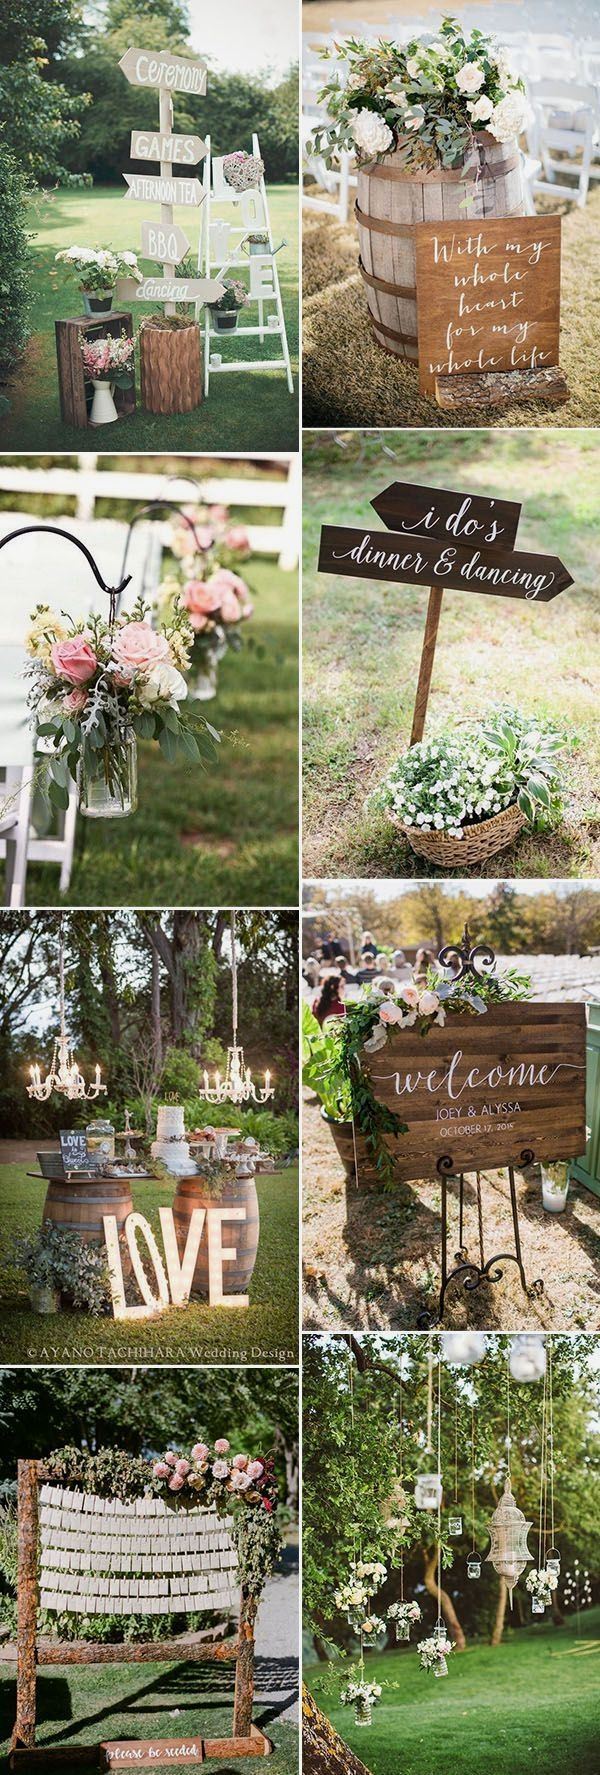 Outdoor Wedding Decoration Outdoor Wedding Decorations Garden Wedding Decorations Wedding Decor Photos